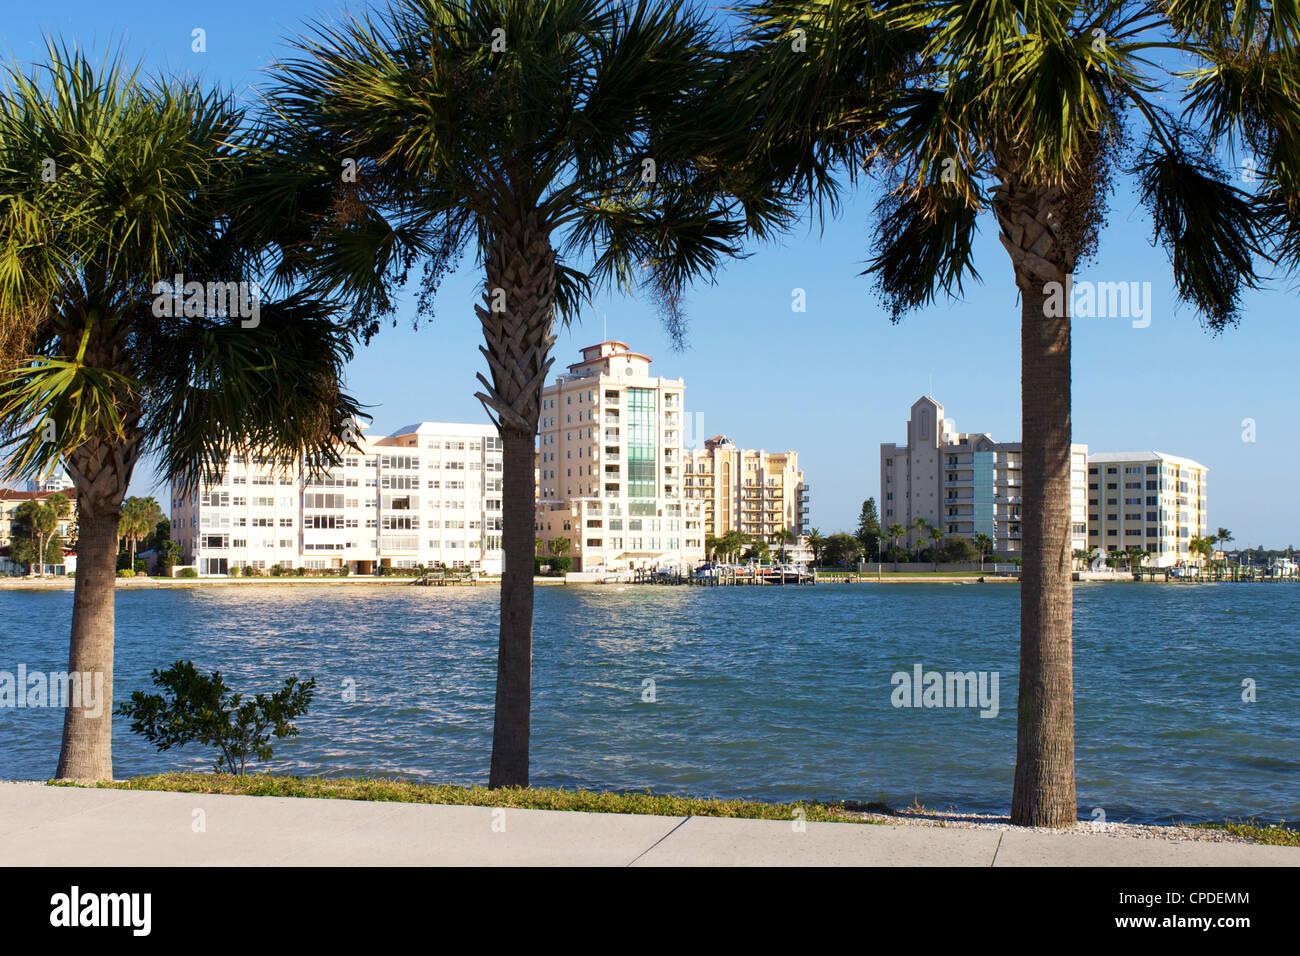 Sarasota, Gulf Coast, Florida, United States of America, North America - Stock Image